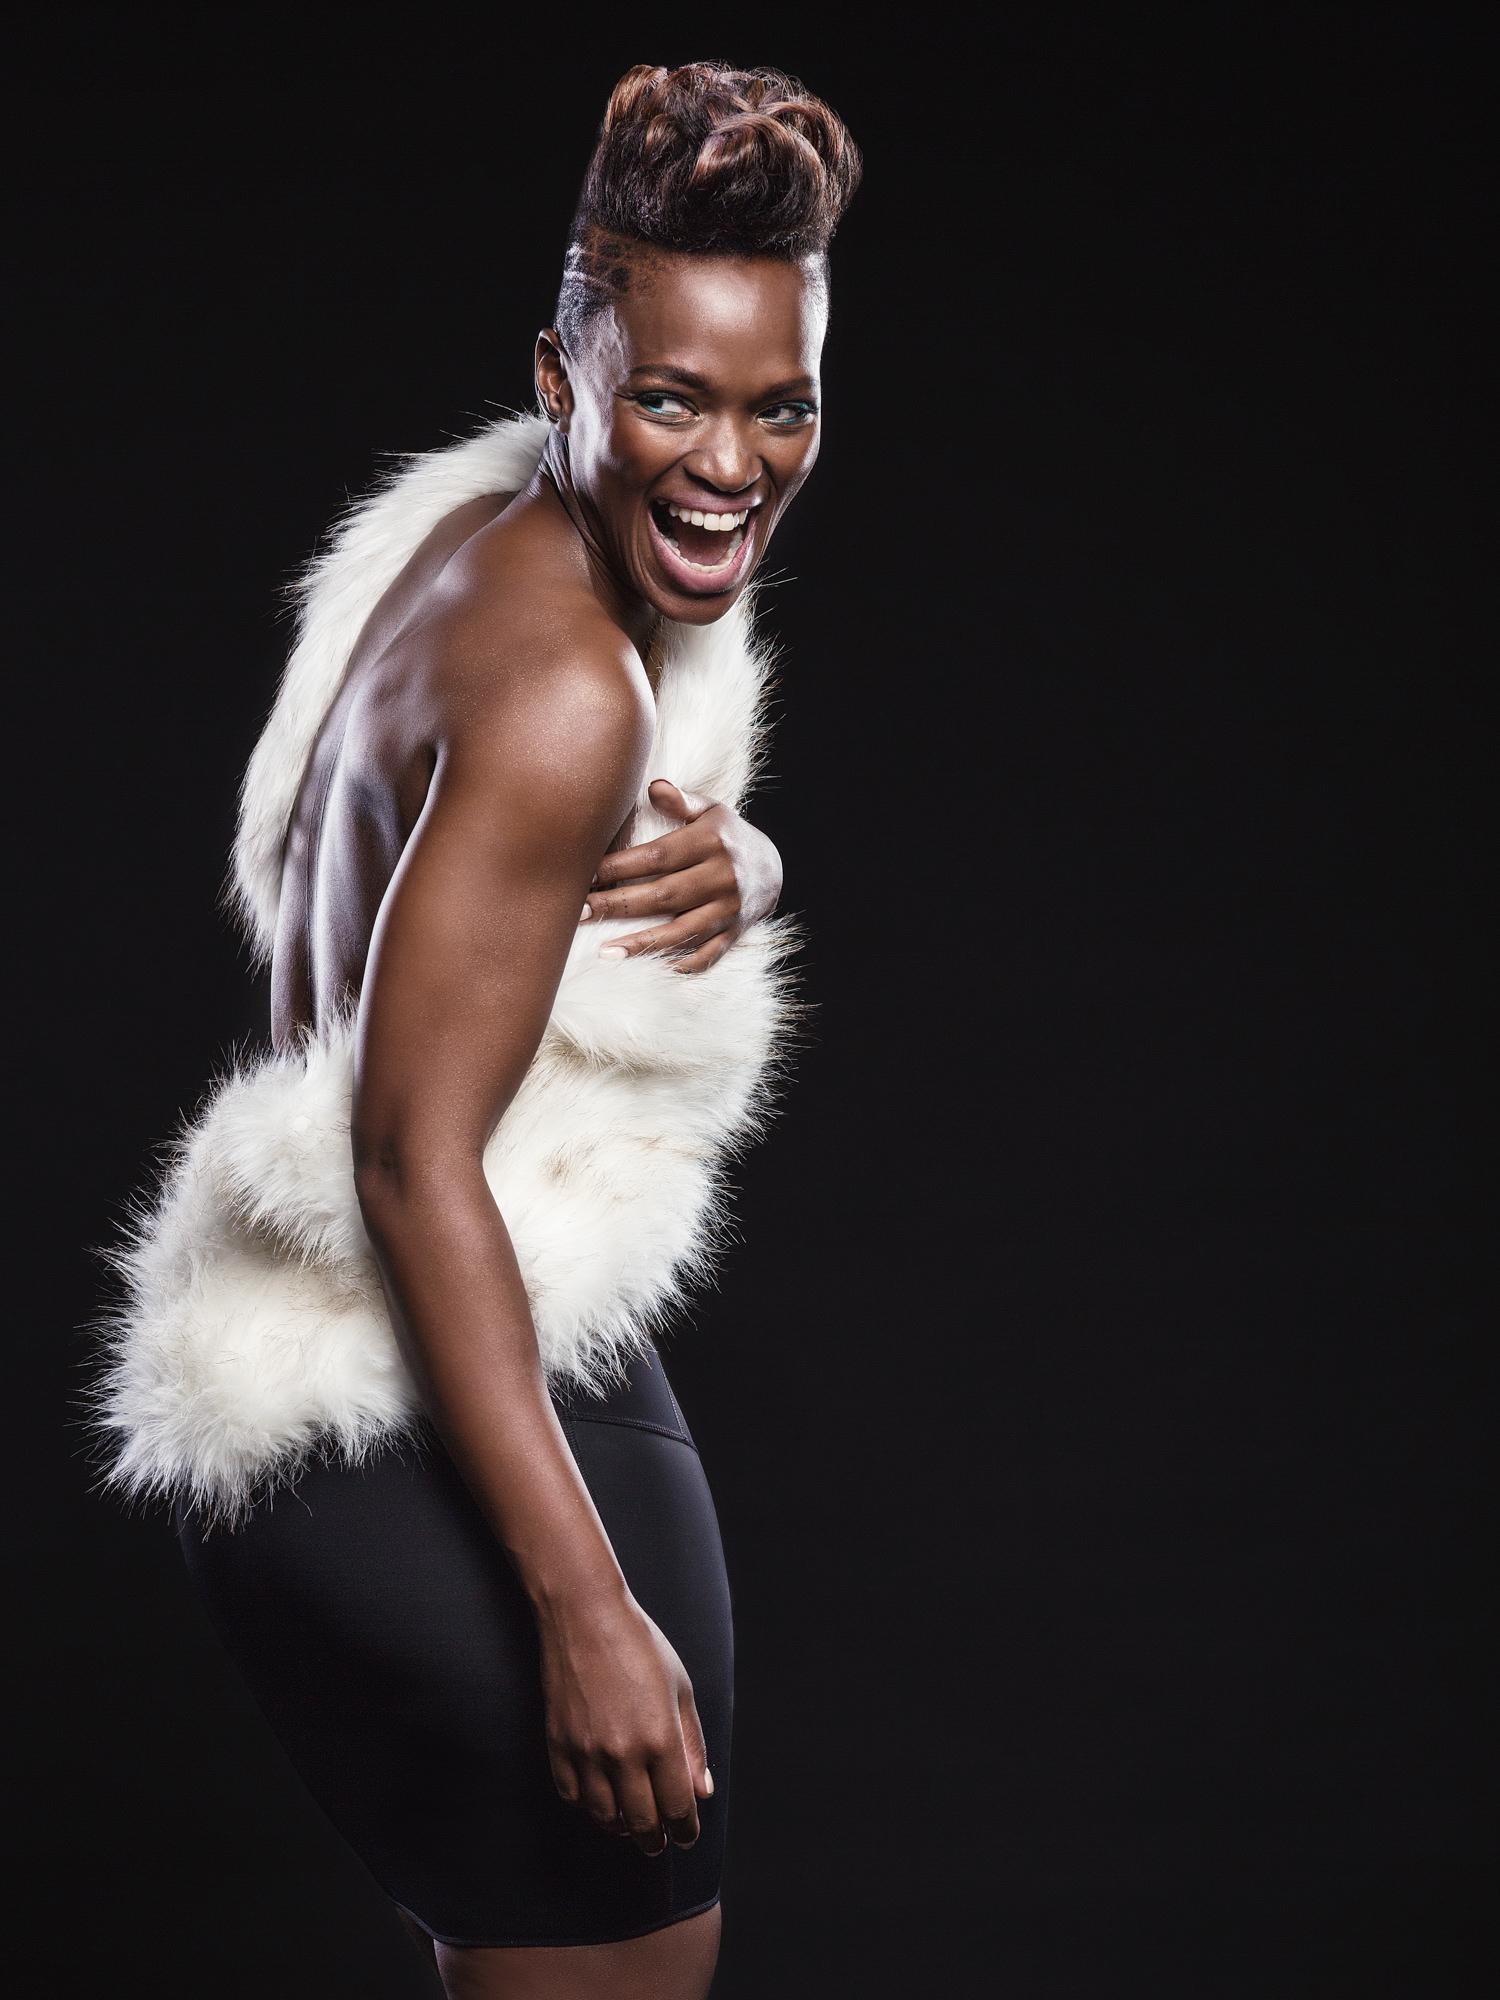 Portrait image of Fikile 'Fix' Moeti for Destiny Magazine's Black Girl Magic feature by Michelle Wastie